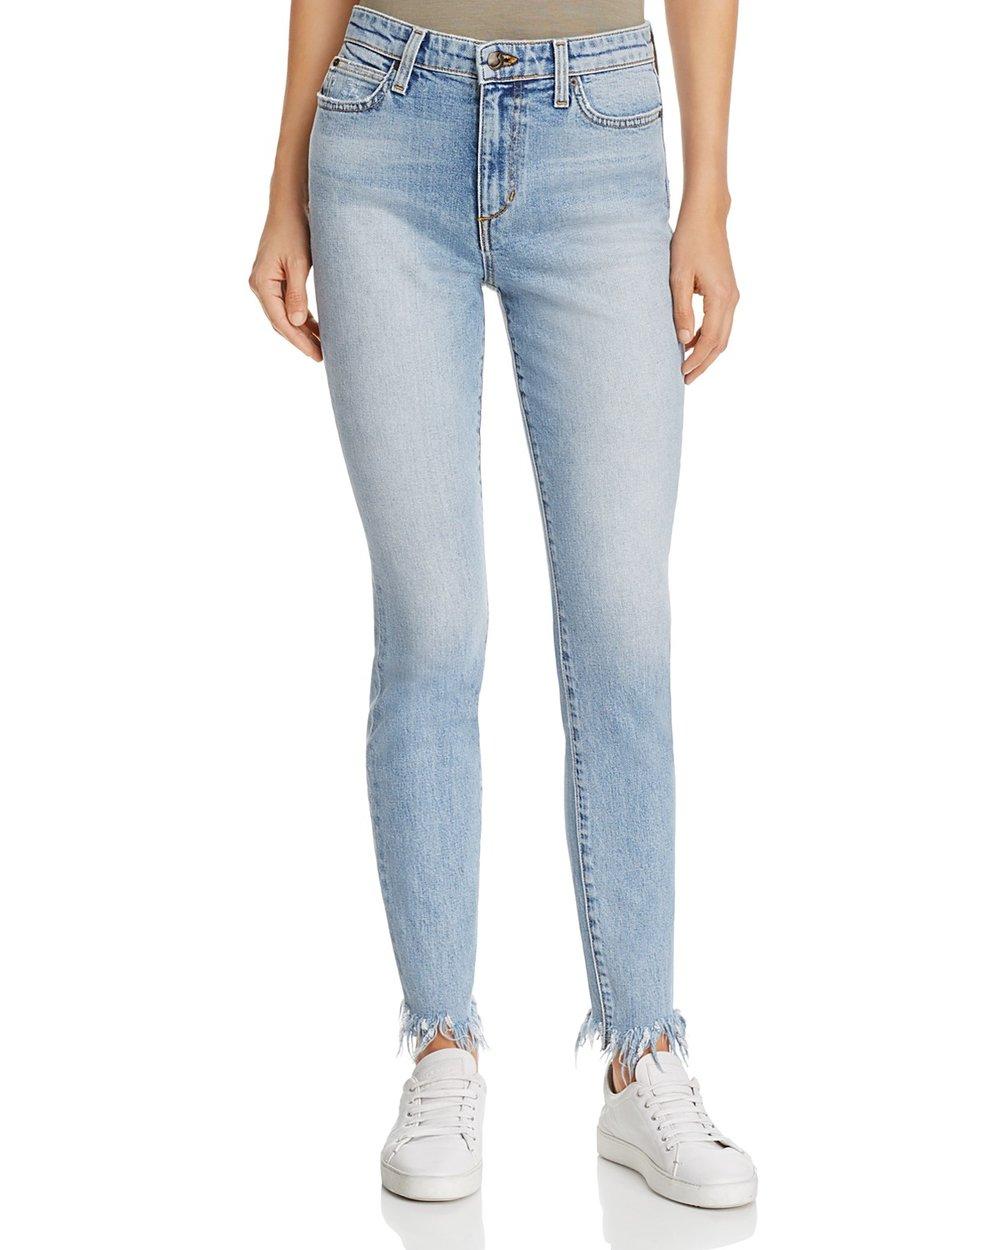 Joe's Jeans denim